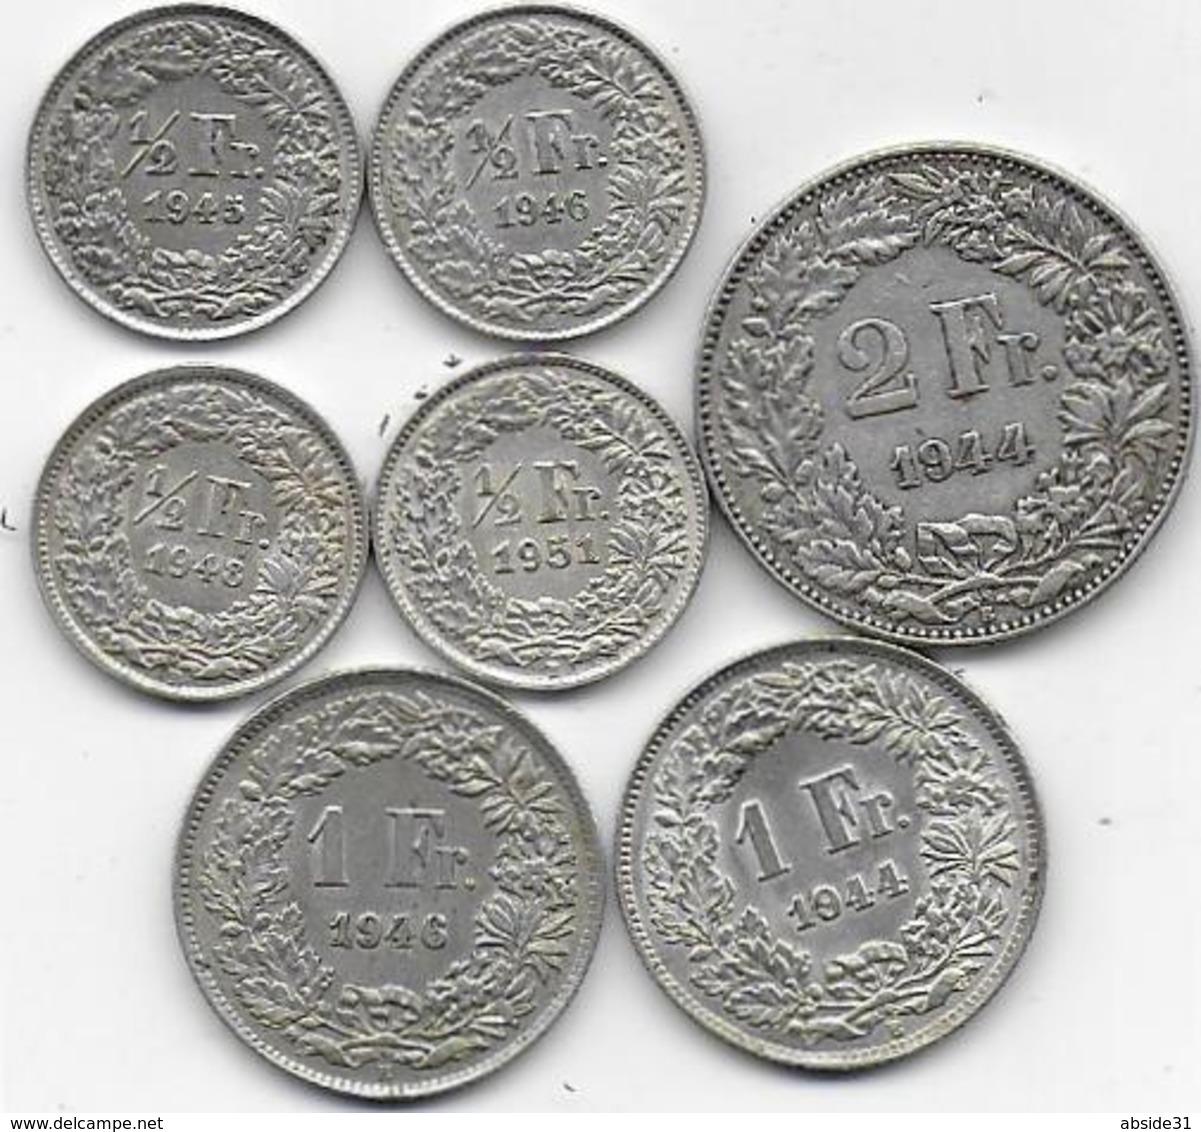 SUISSE - 7 Pièces - 1/2 Fr 1945 - 1946 - 1948 - 1951 - 1Fr 1944 - 1946 - 2 Fr 1944 - Suisse